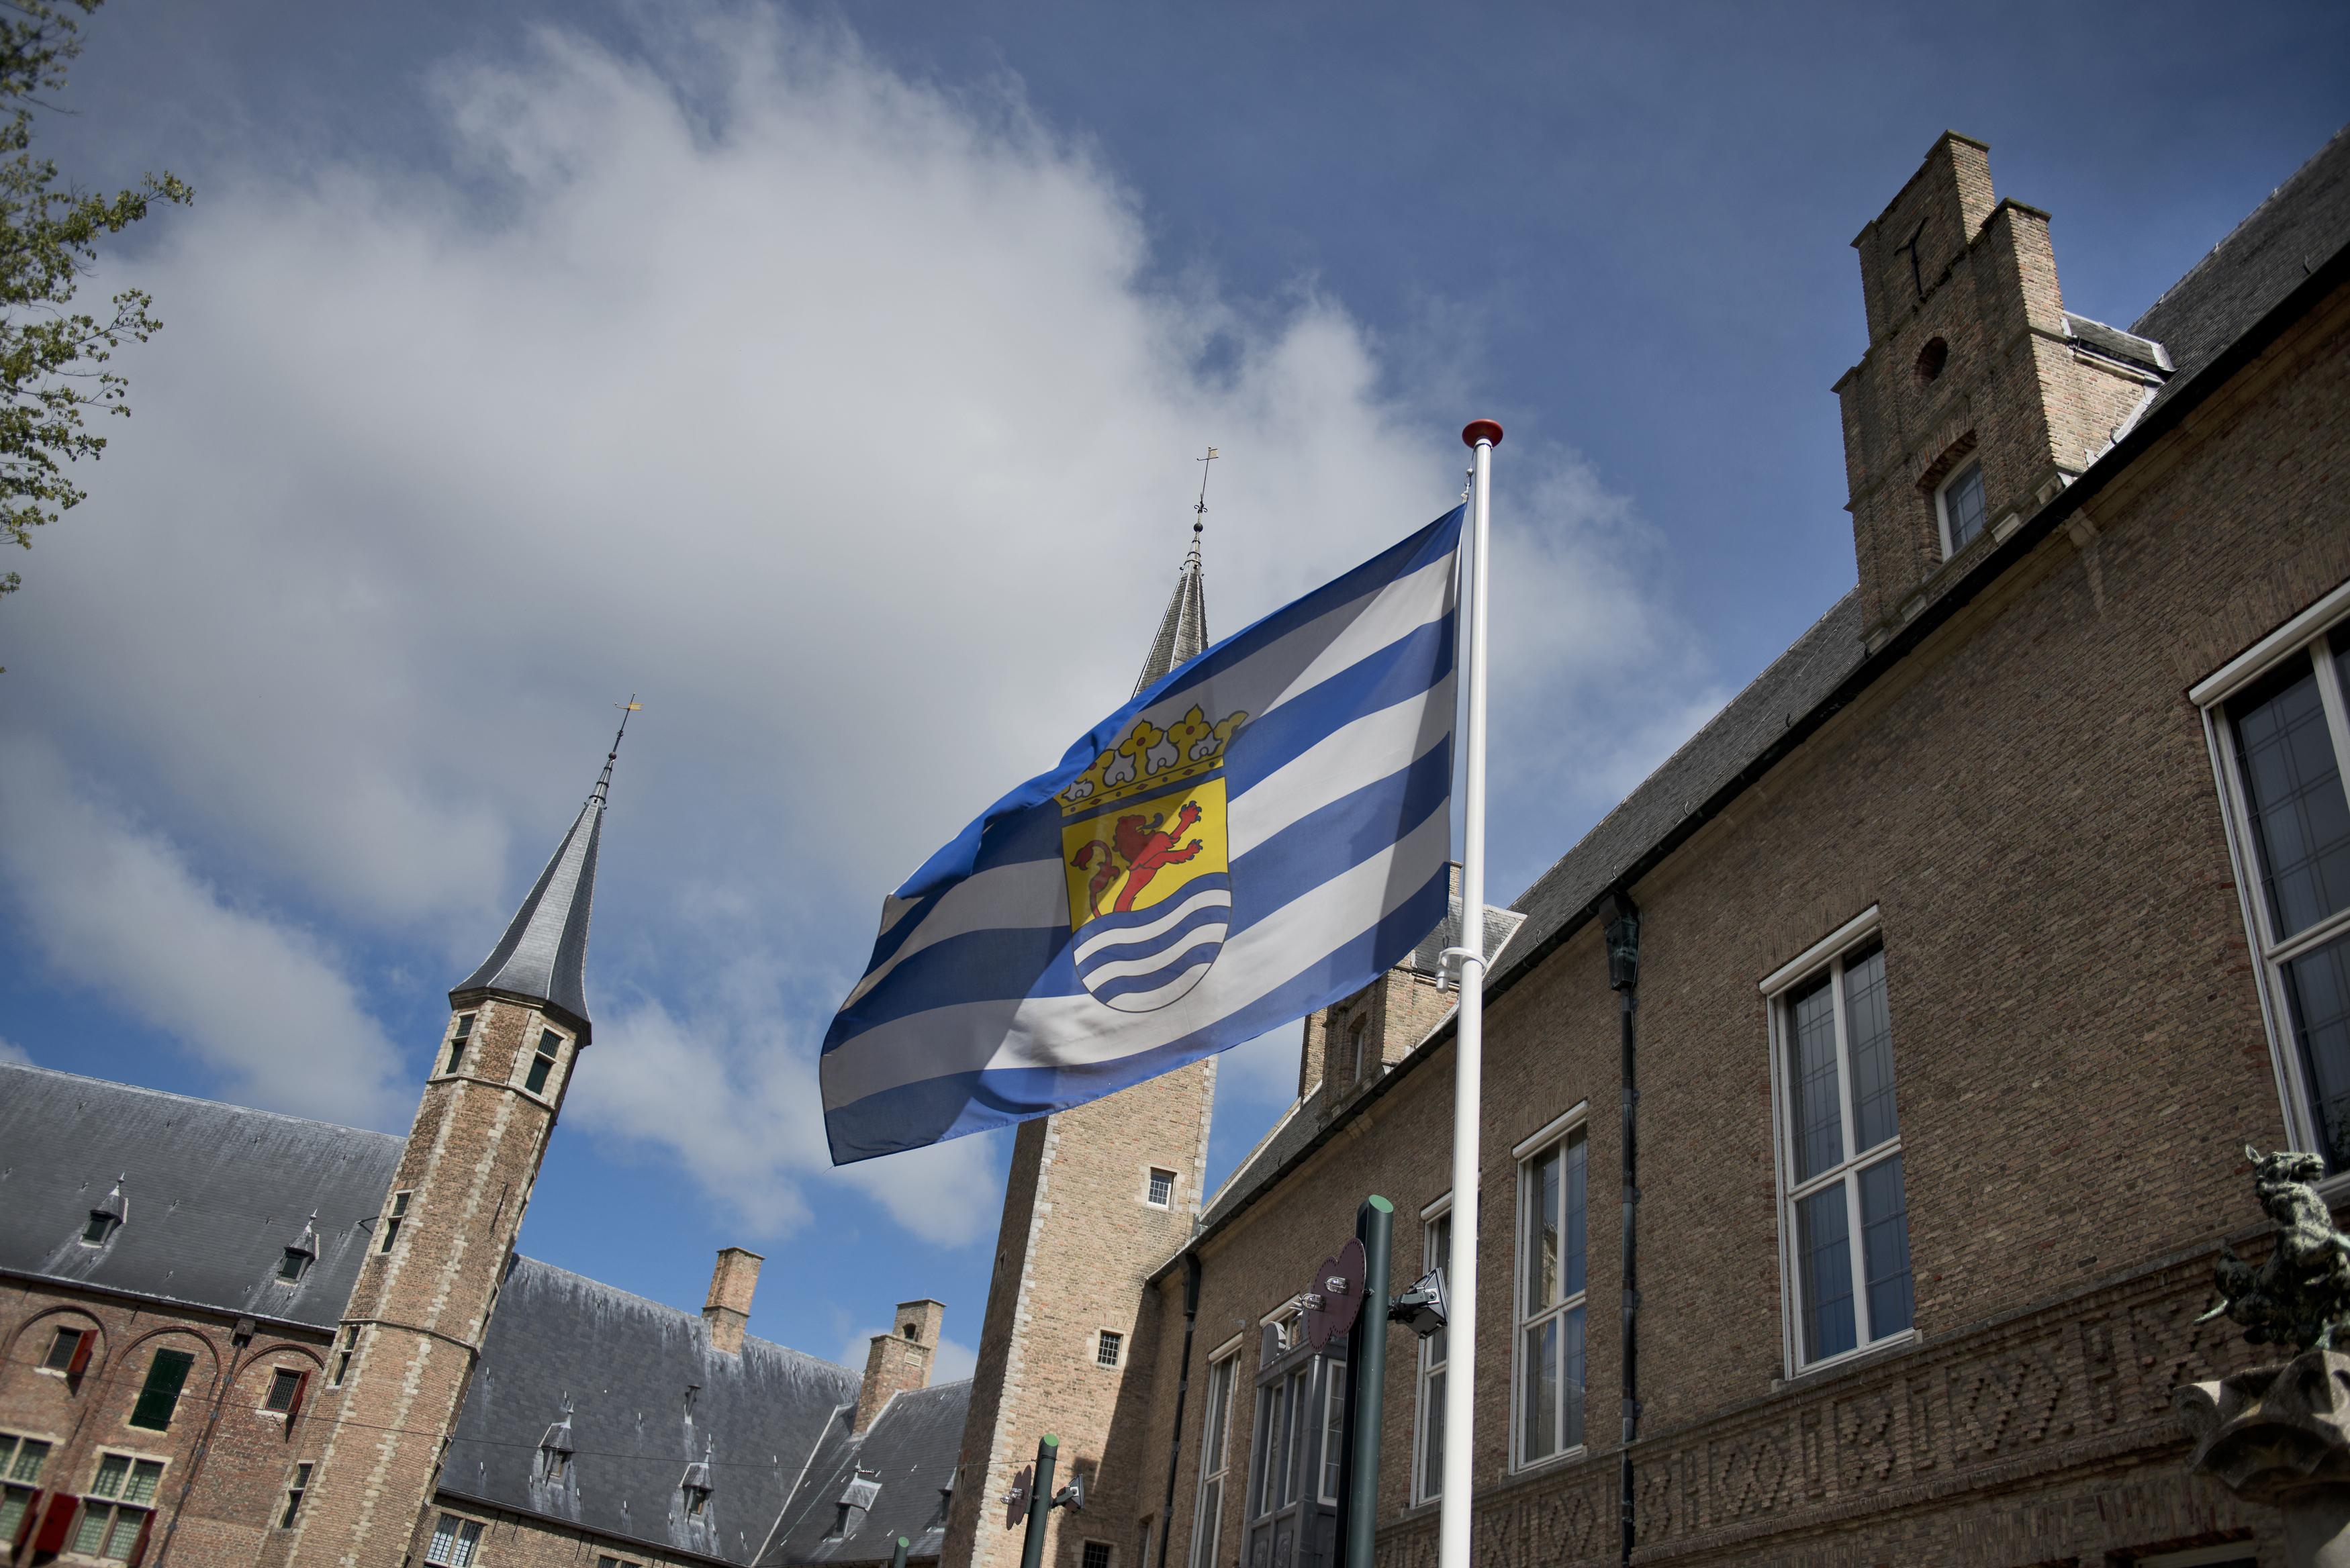 Zeeuwse vlag wapperend op Abdijplein